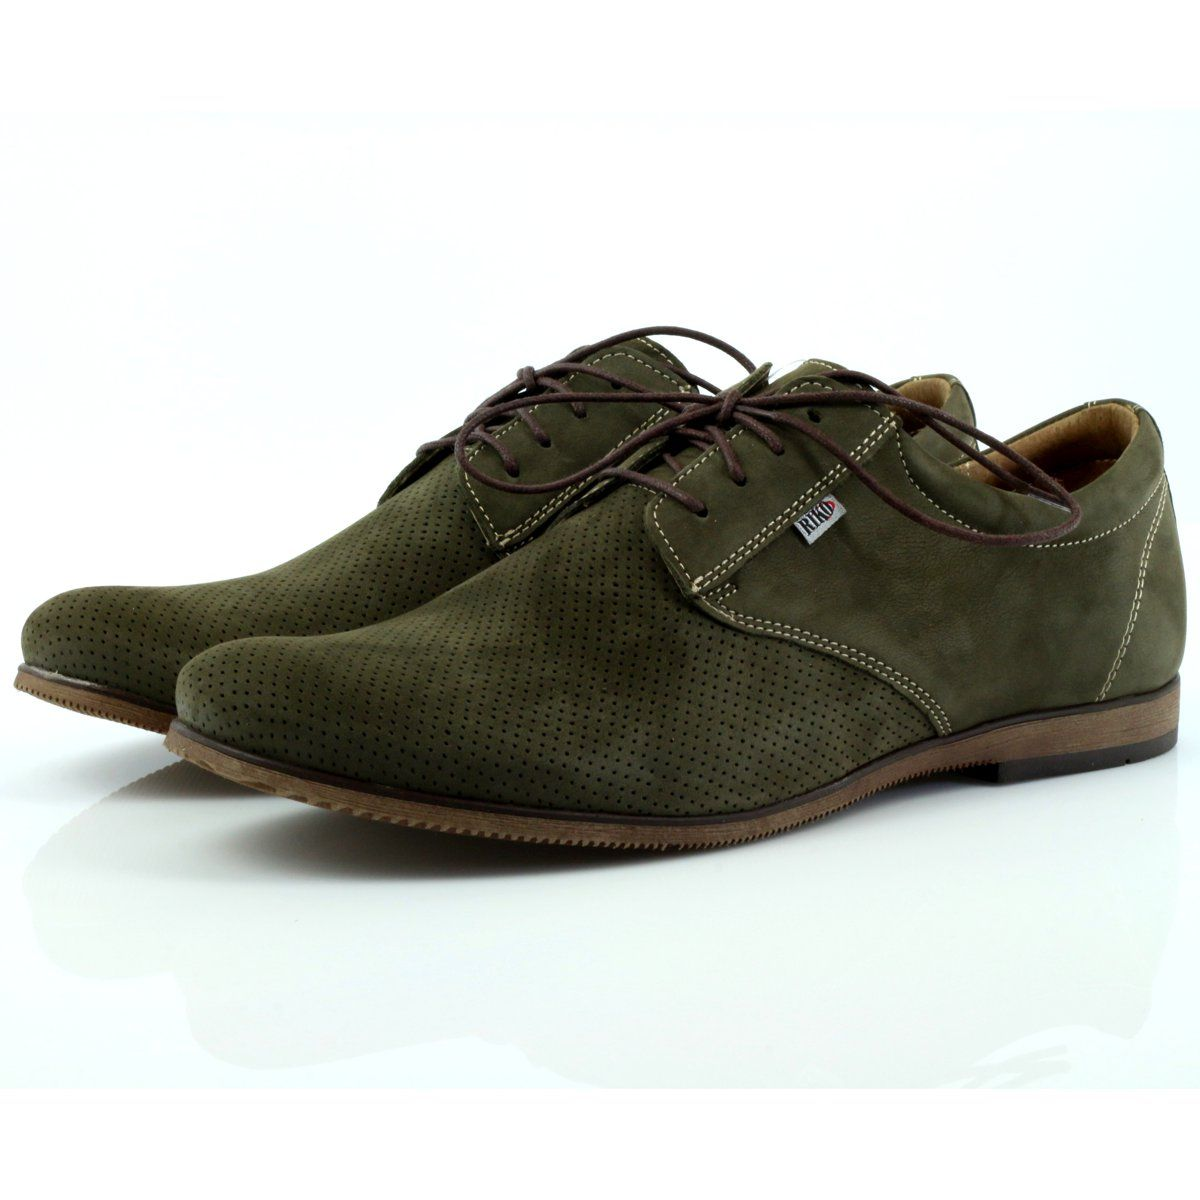 Riko Buty Meskie Polbuty Casual 777d Zielone Oxford Shoes Dress Shoes Dress Shoes Men